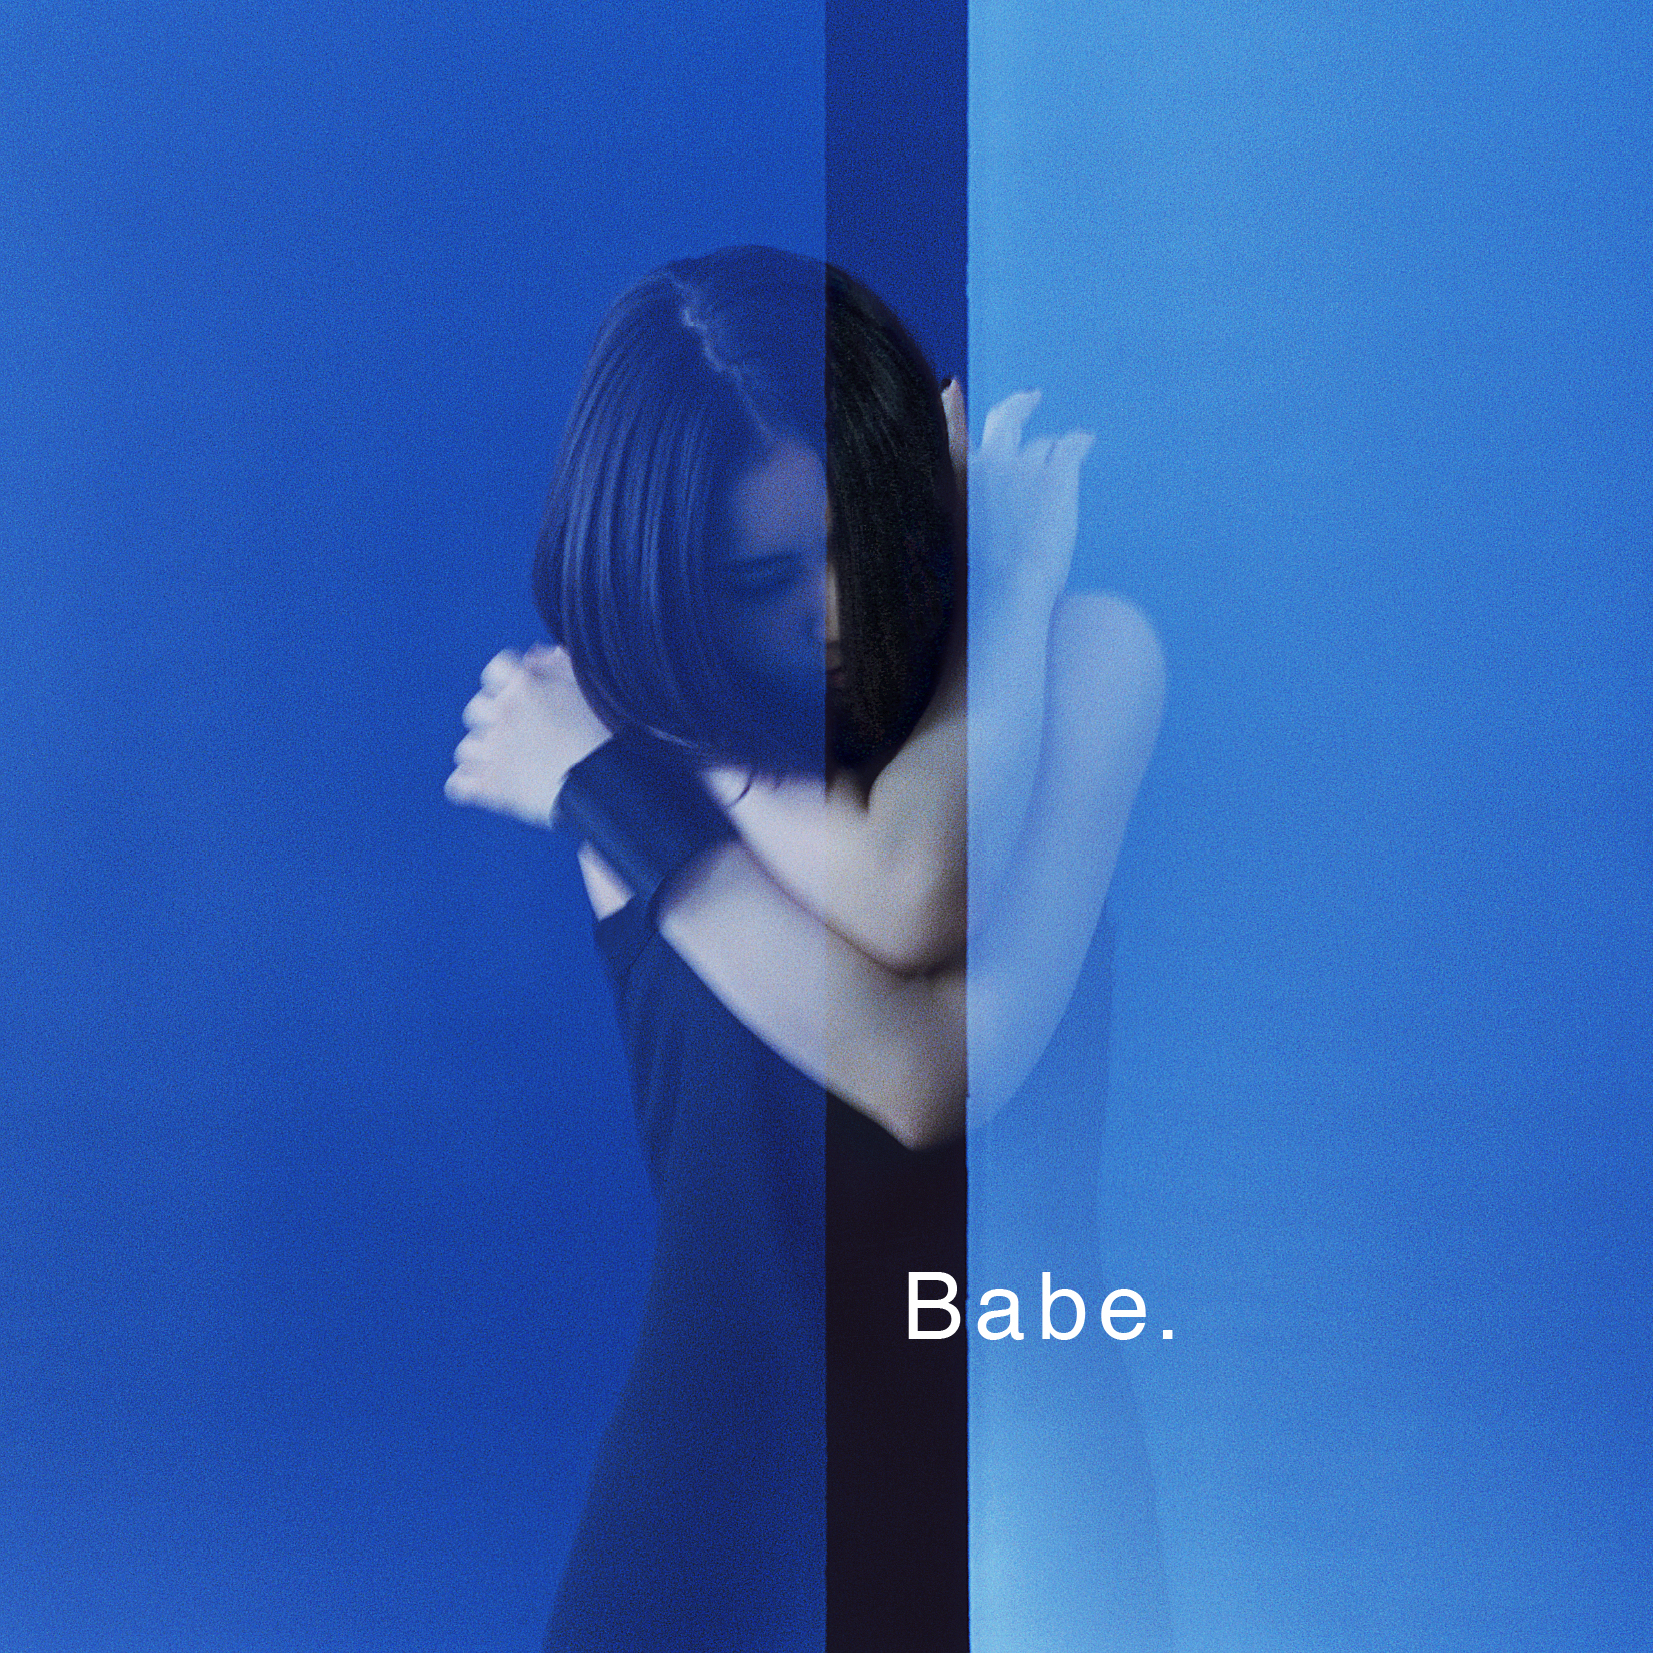 7thアルバム『Babe.』【通常盤】